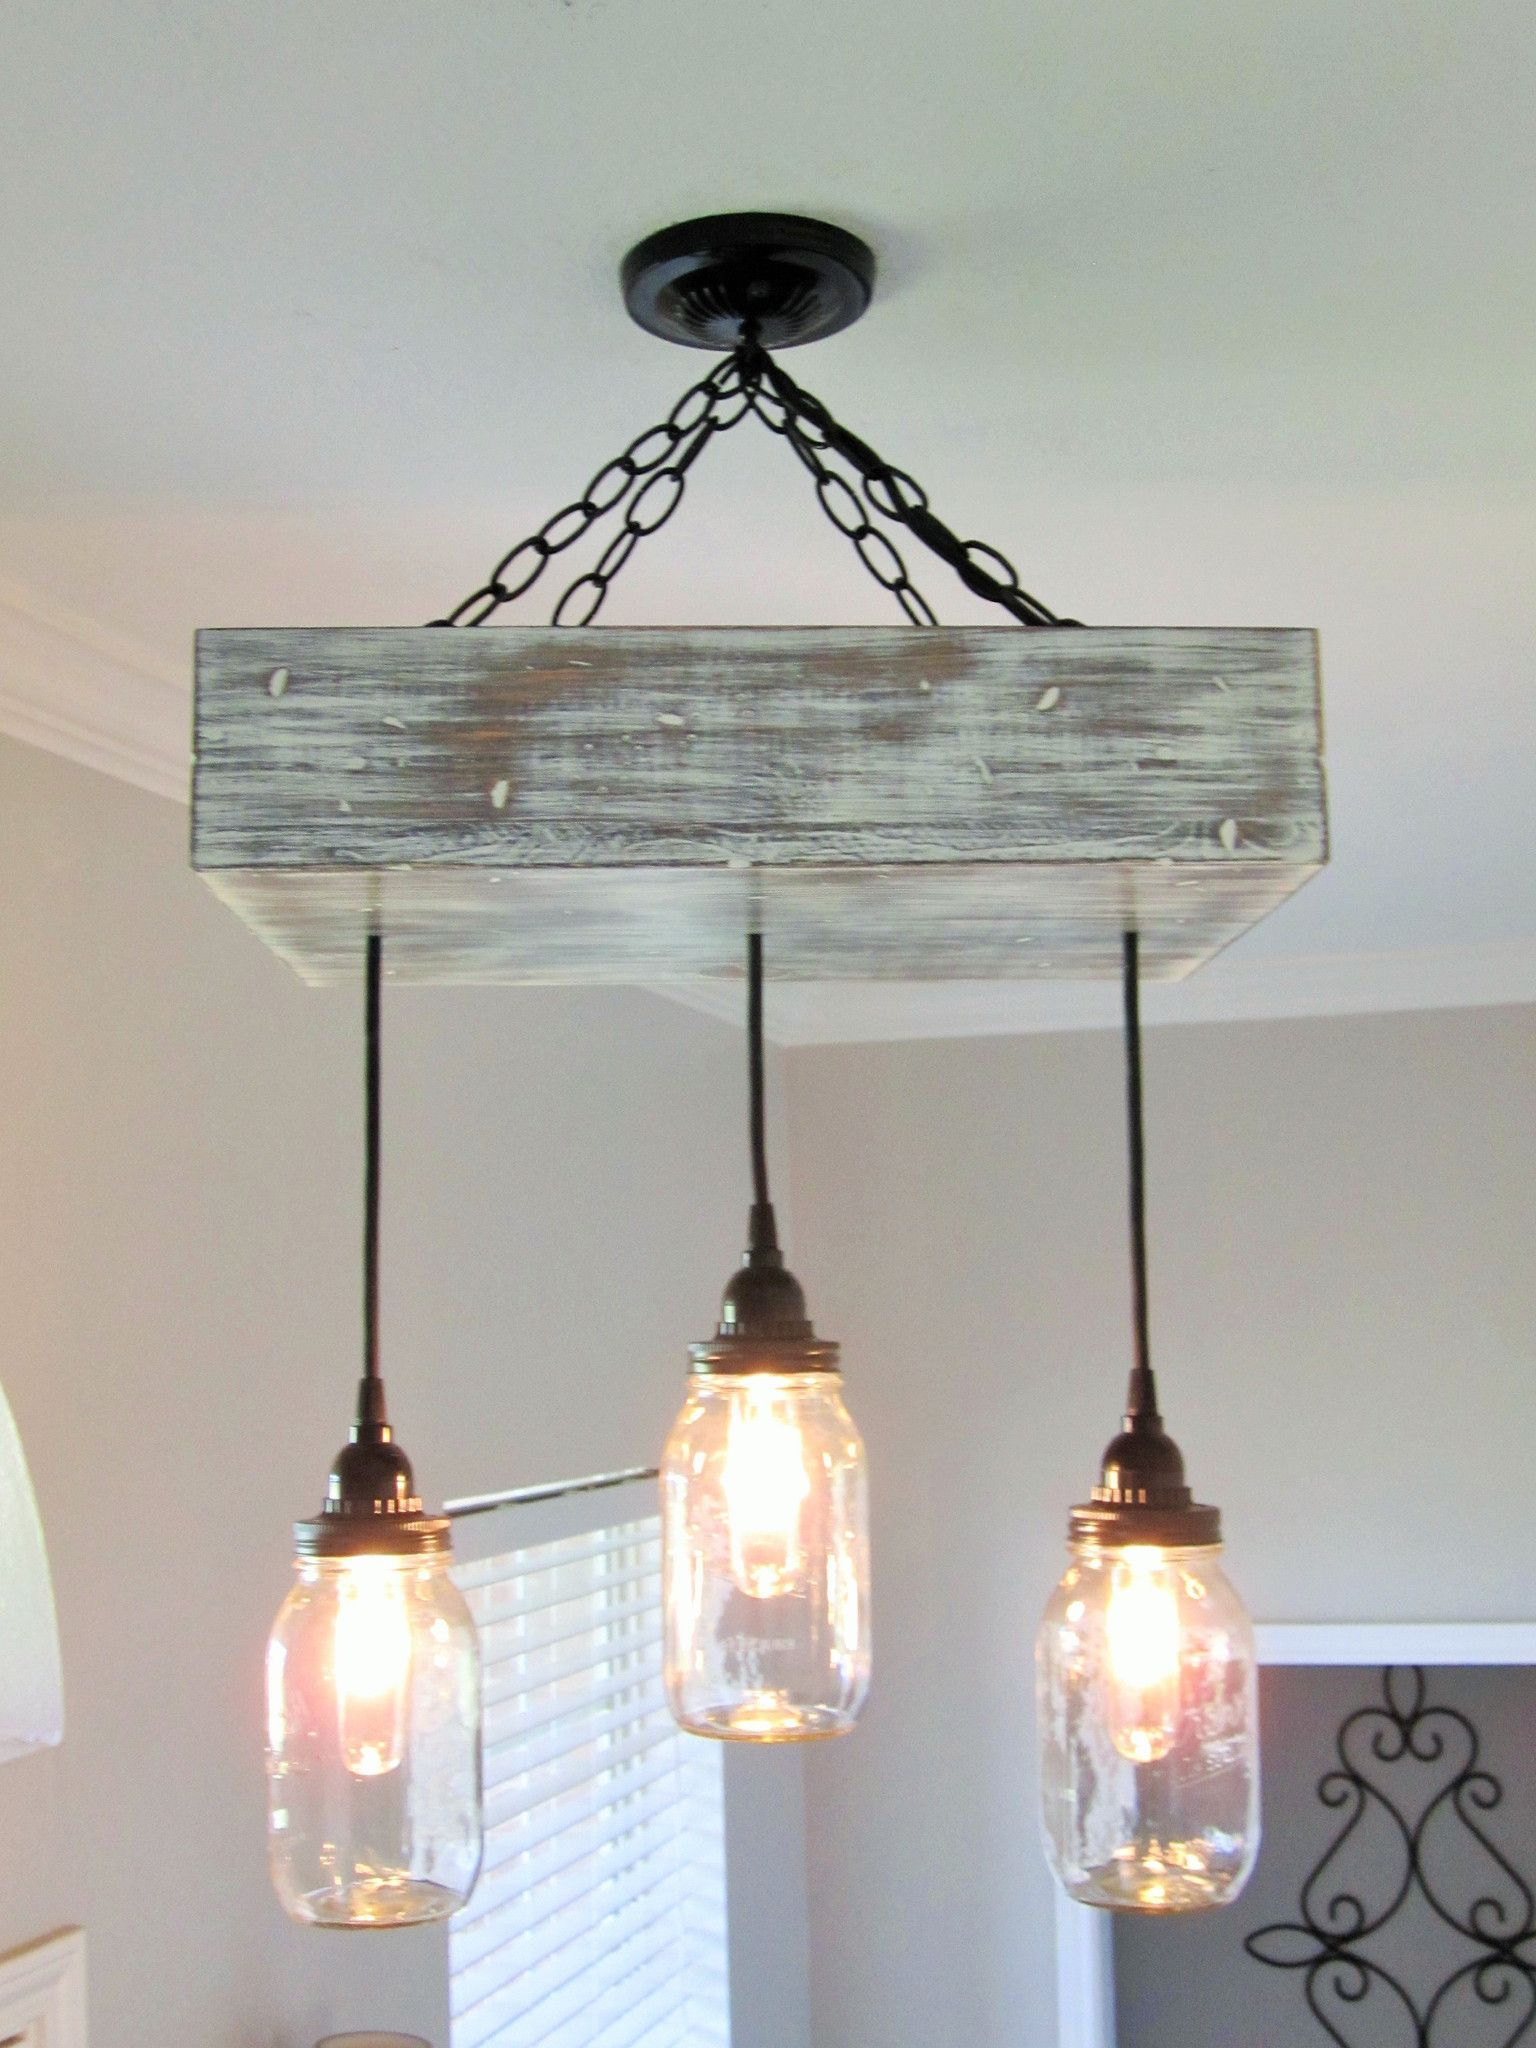 Mason jar chandelier with 3 jars kitchen pinterest luces mason jar chandelier with 3 jars aloadofball Images